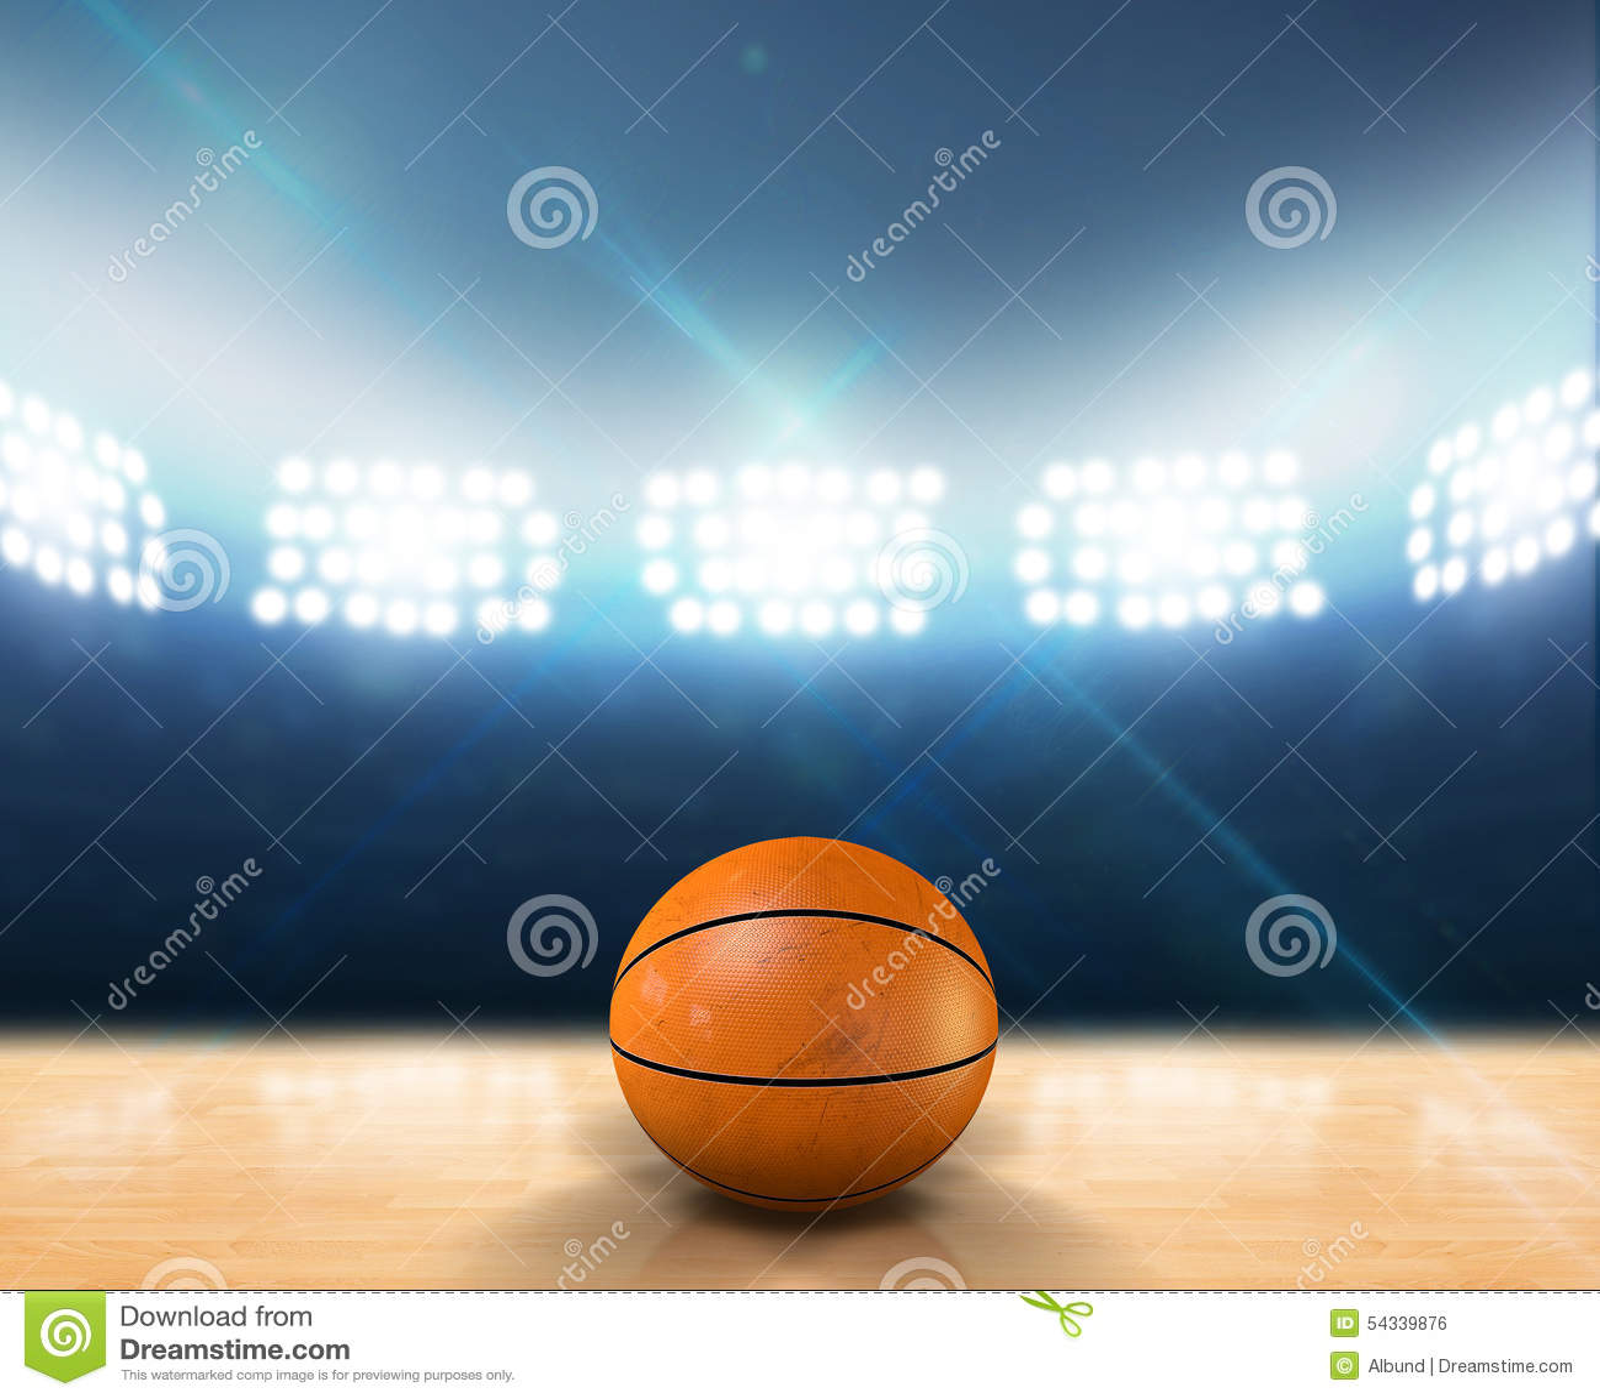 Arenabetting basketball headingley 1981 betting websites